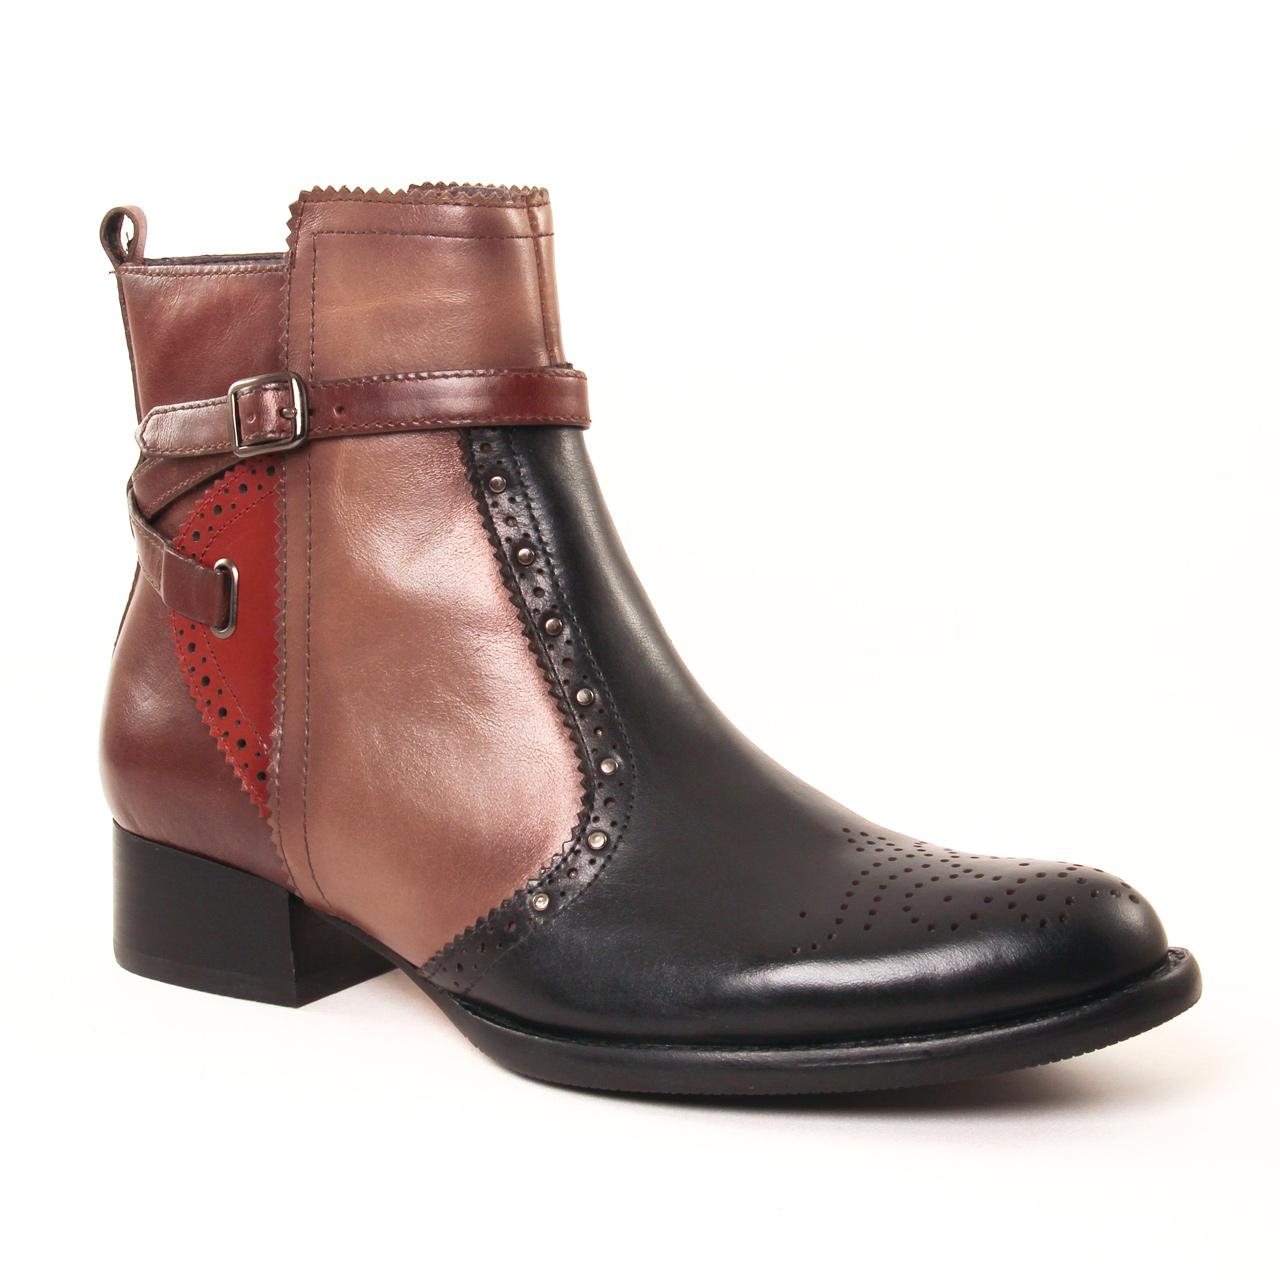 mamzelle josya box noir | boot jodhpur noir marron automne hiver